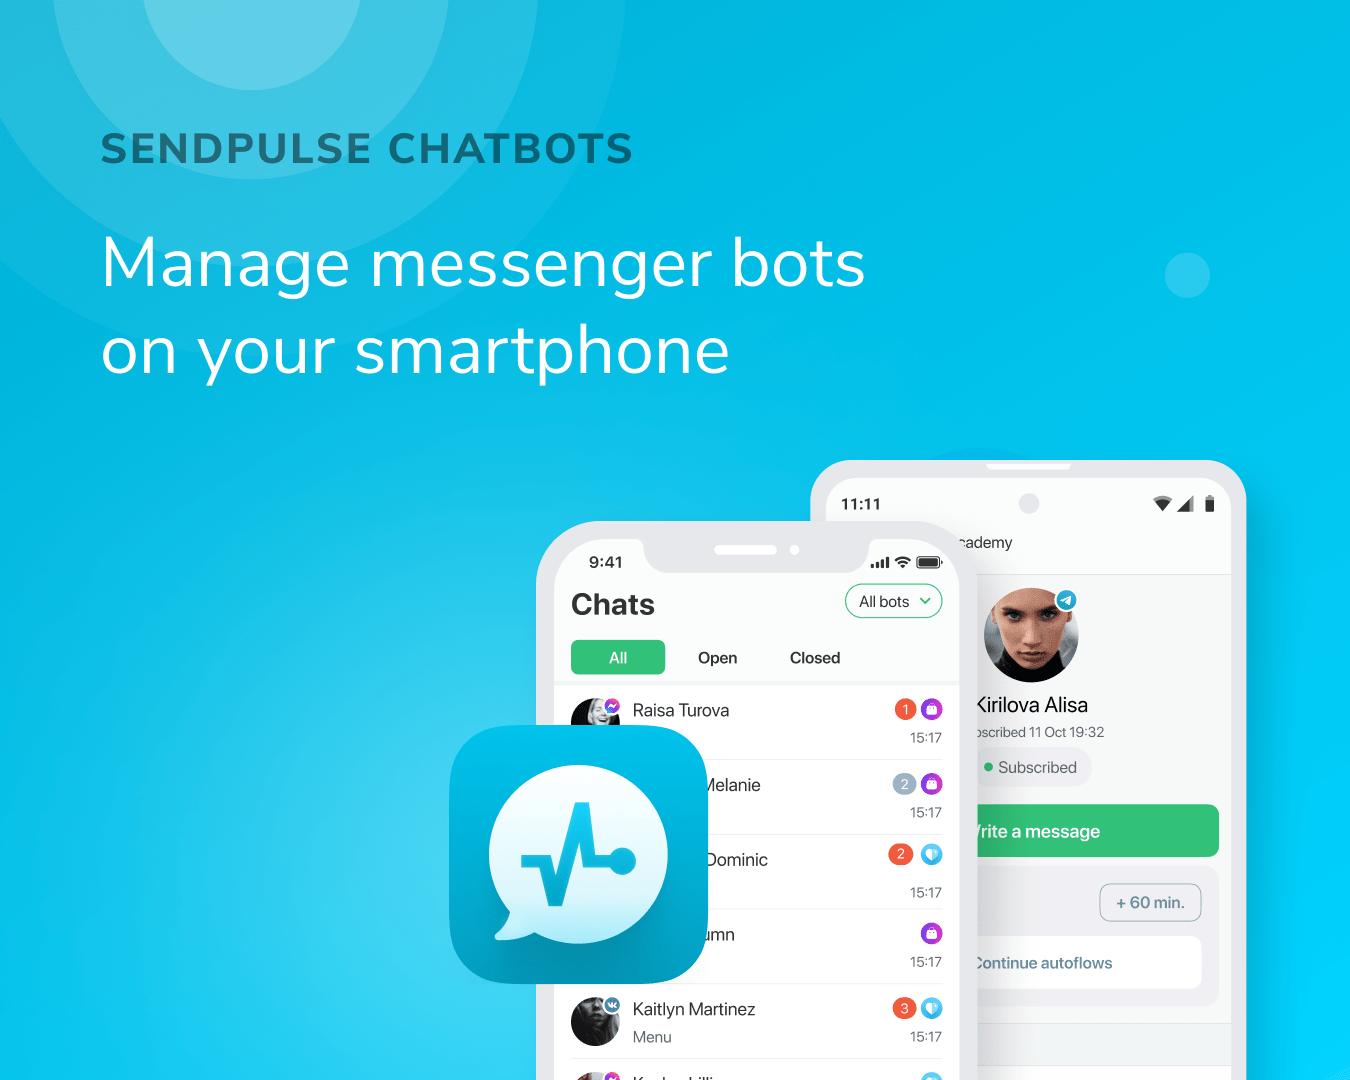 Sendpulse Chatbots